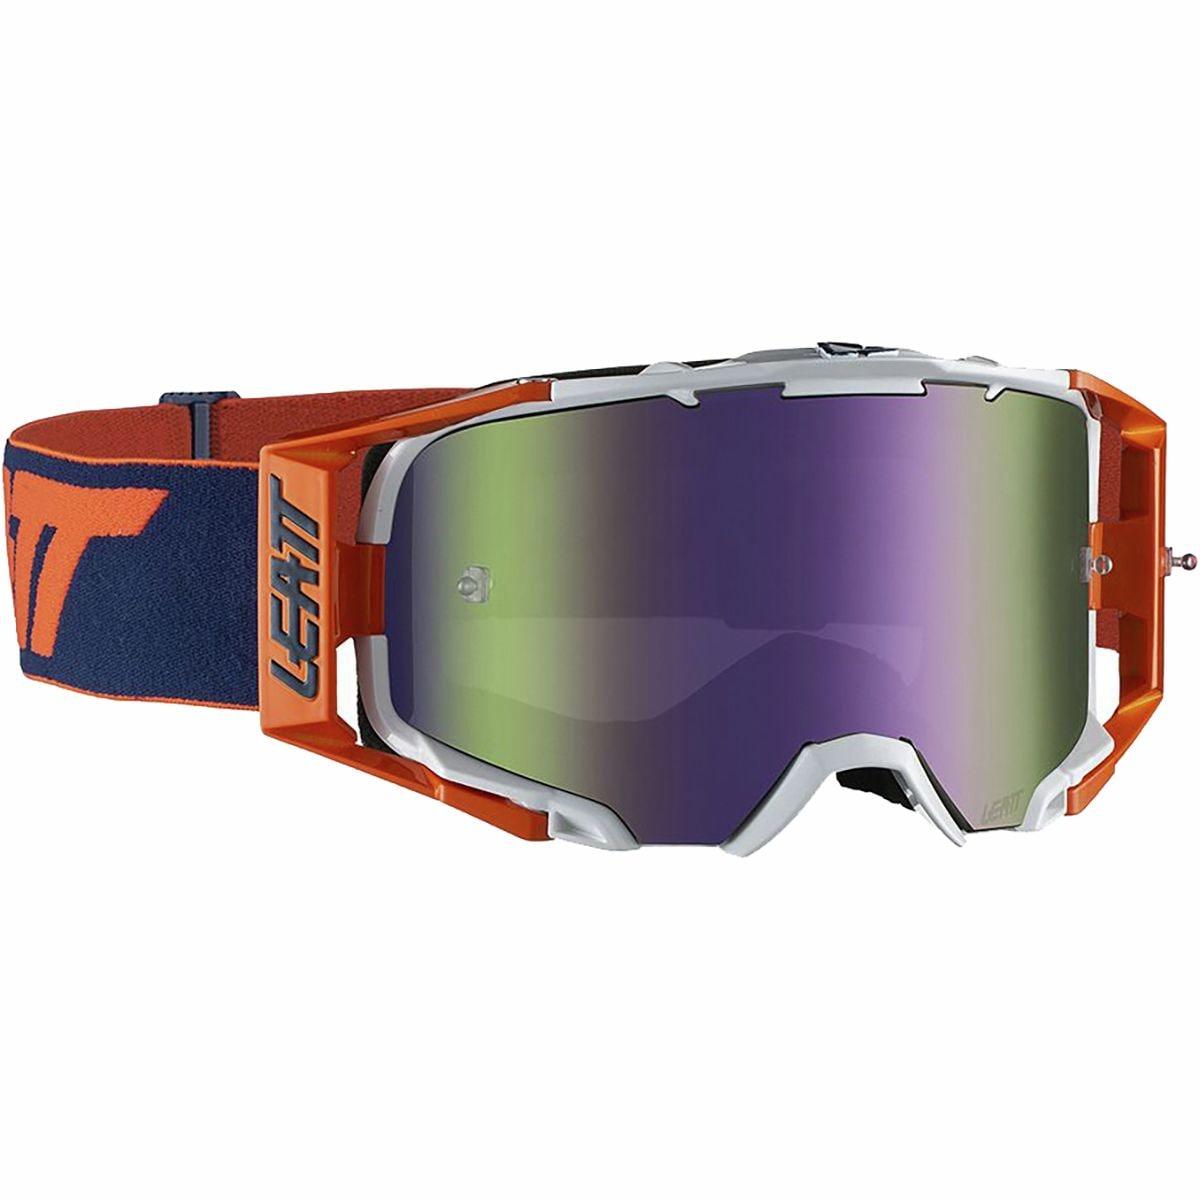 Details about  /Leatt Velocity 6.5 Iriz Goggles